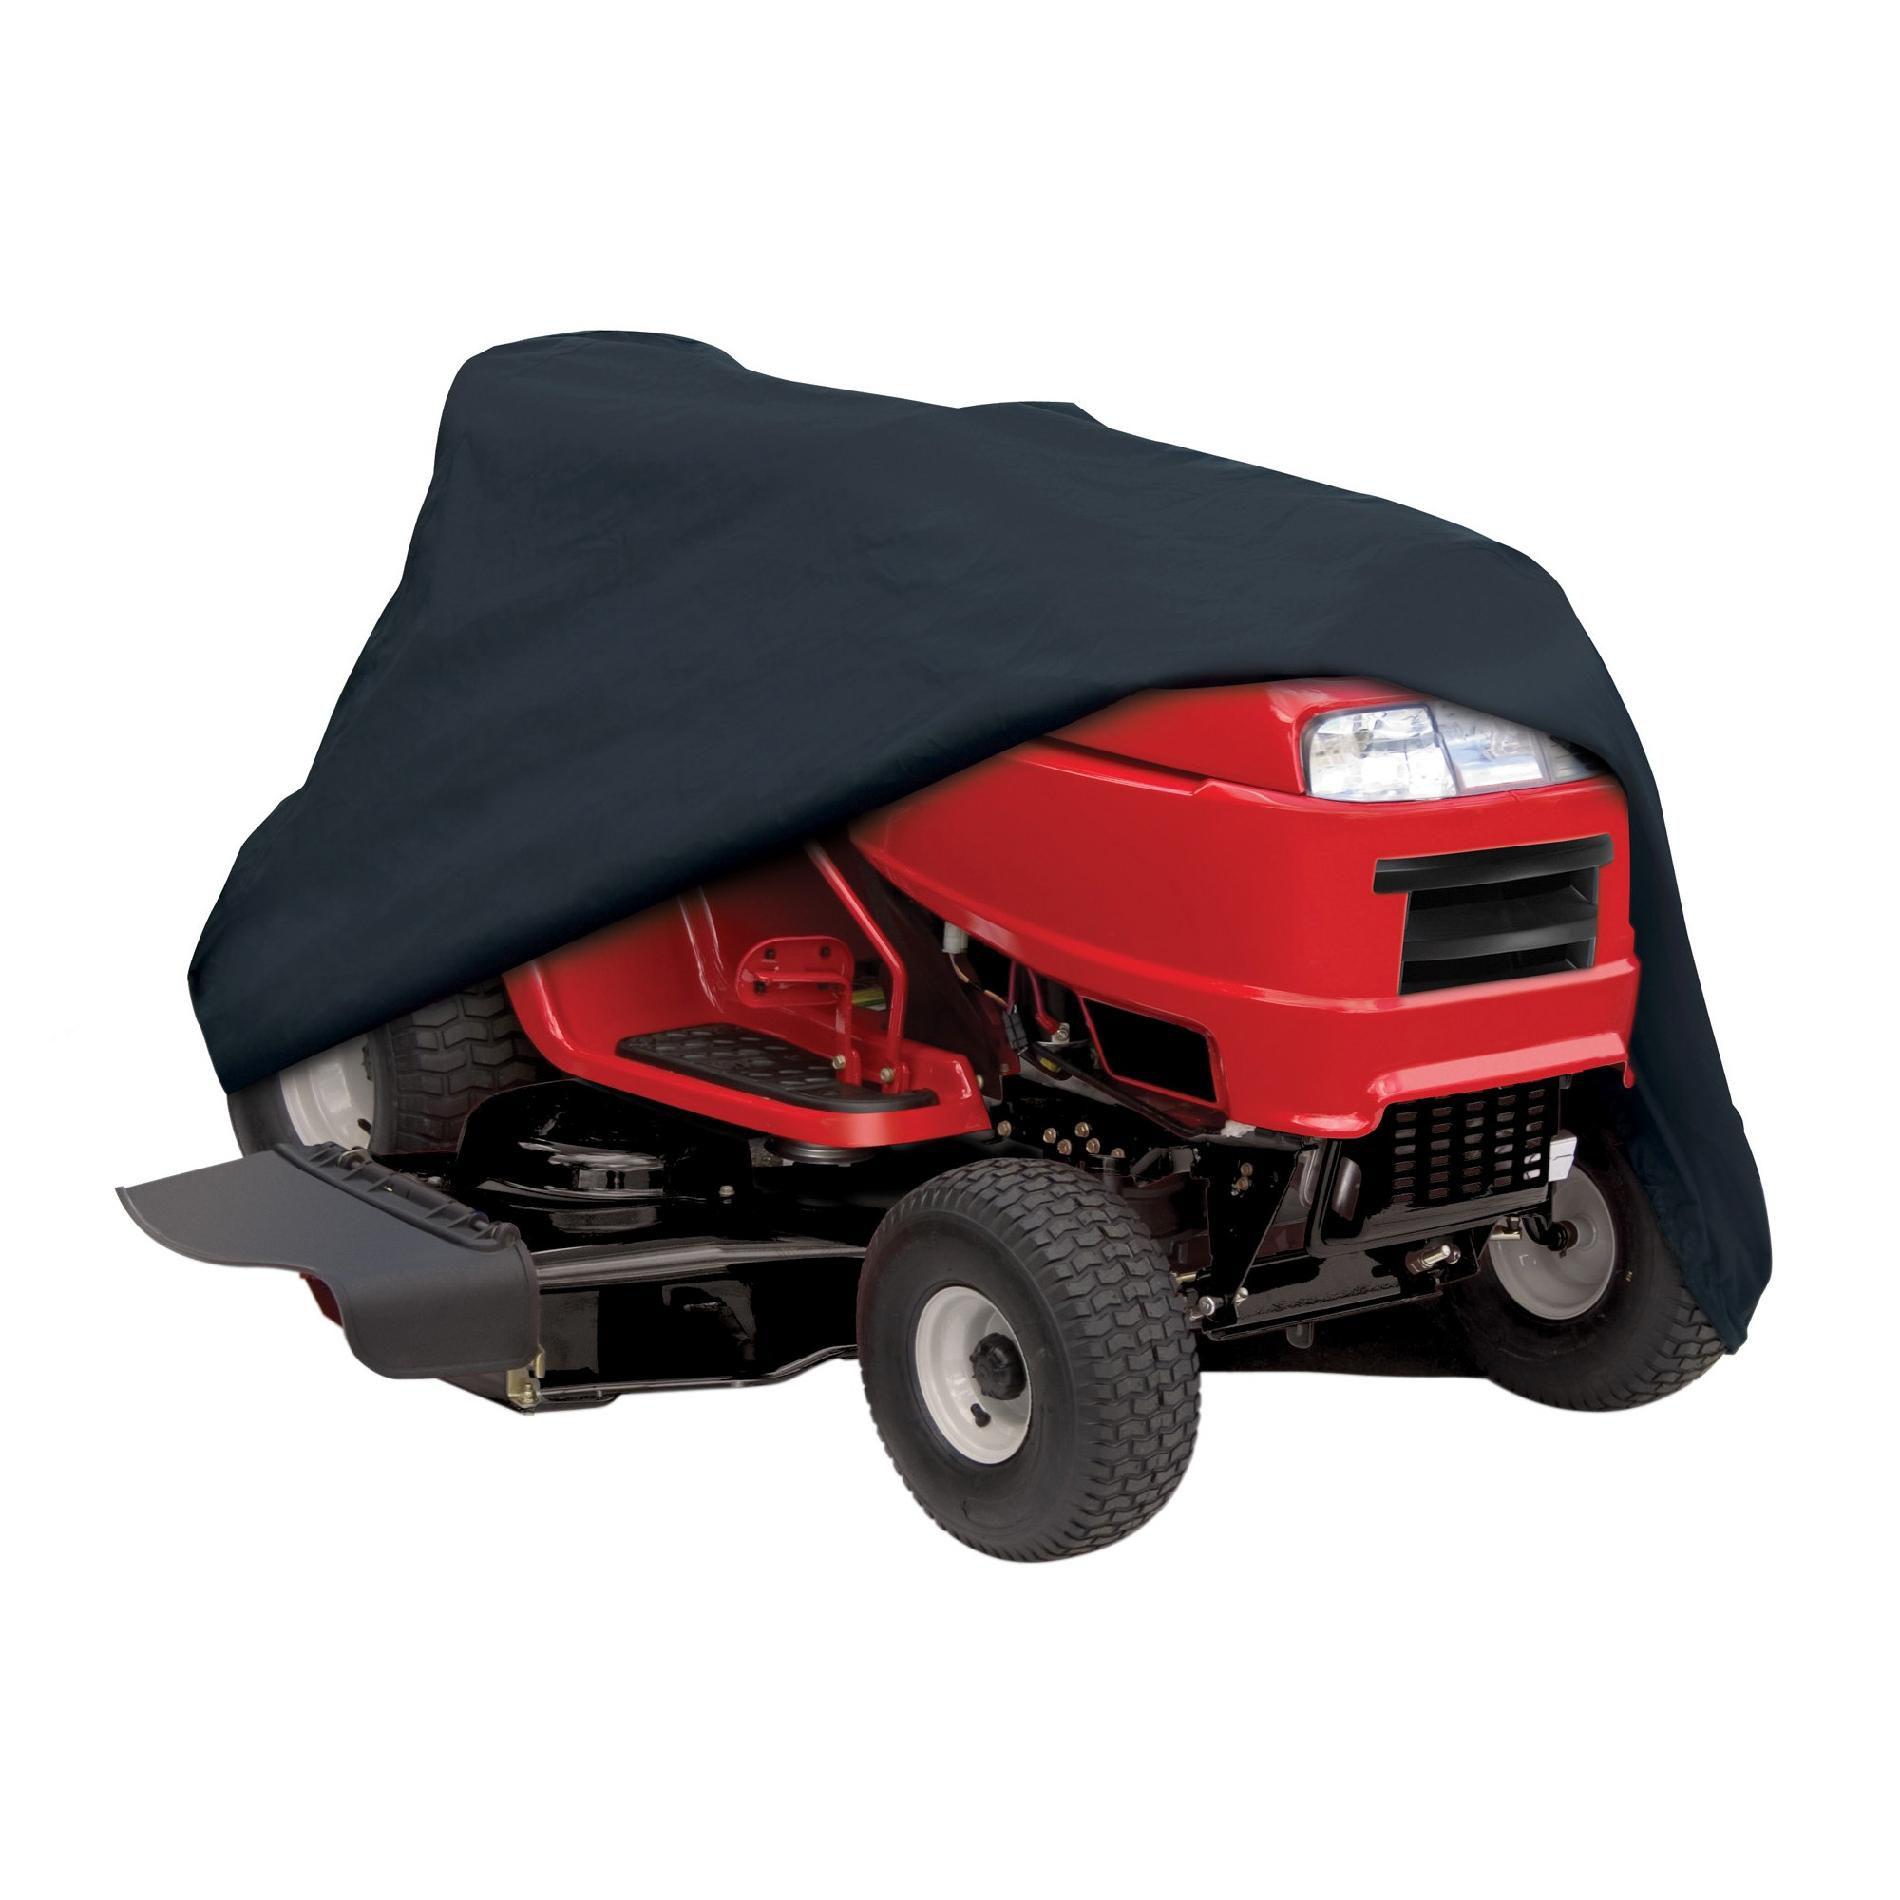 Sears Garden Tractor Seat : Classic accessories lawn tractor cover garden